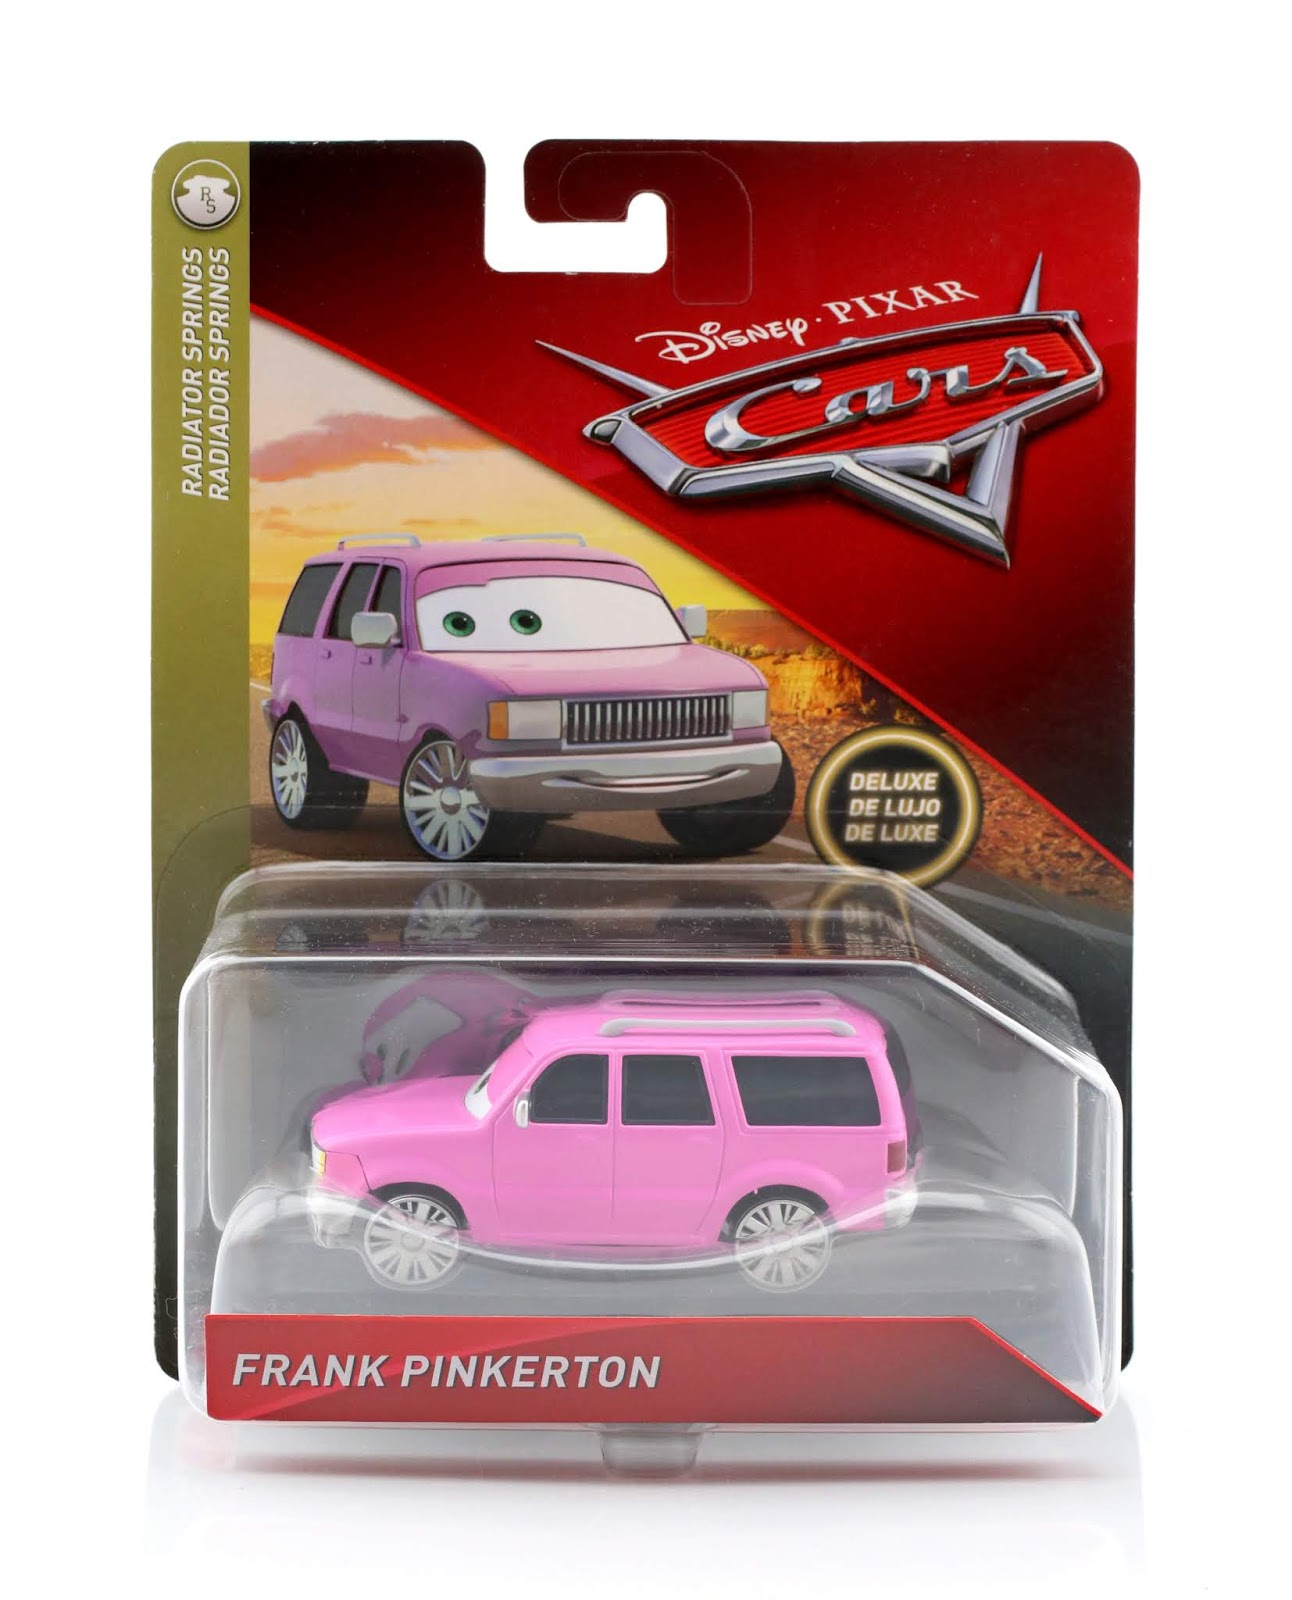 cars mattel frank pinkerton diecast review